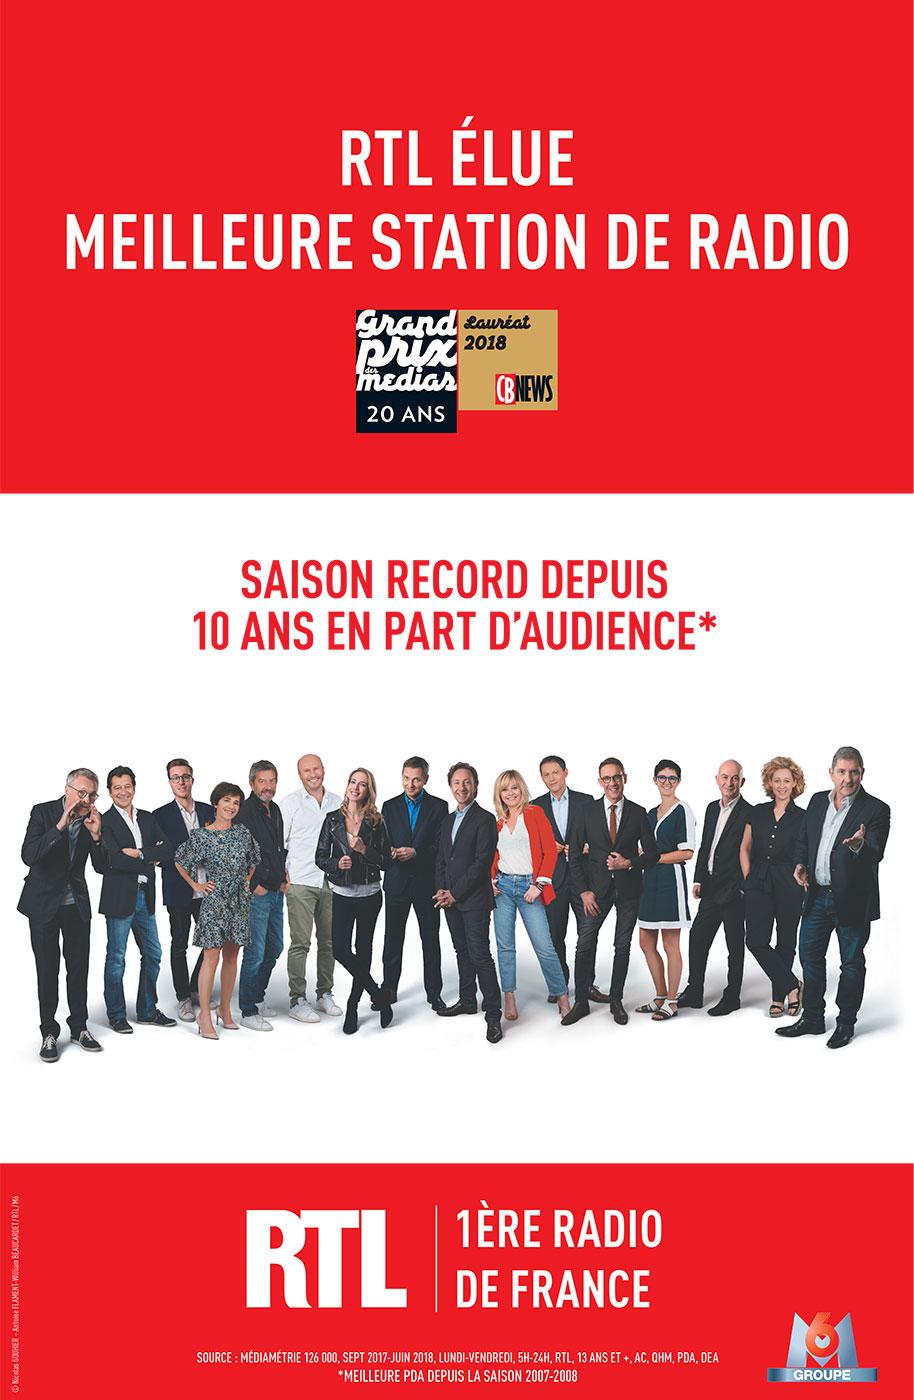 RTL meilleure station de radio de l'année Grand Prix des Medias CB News